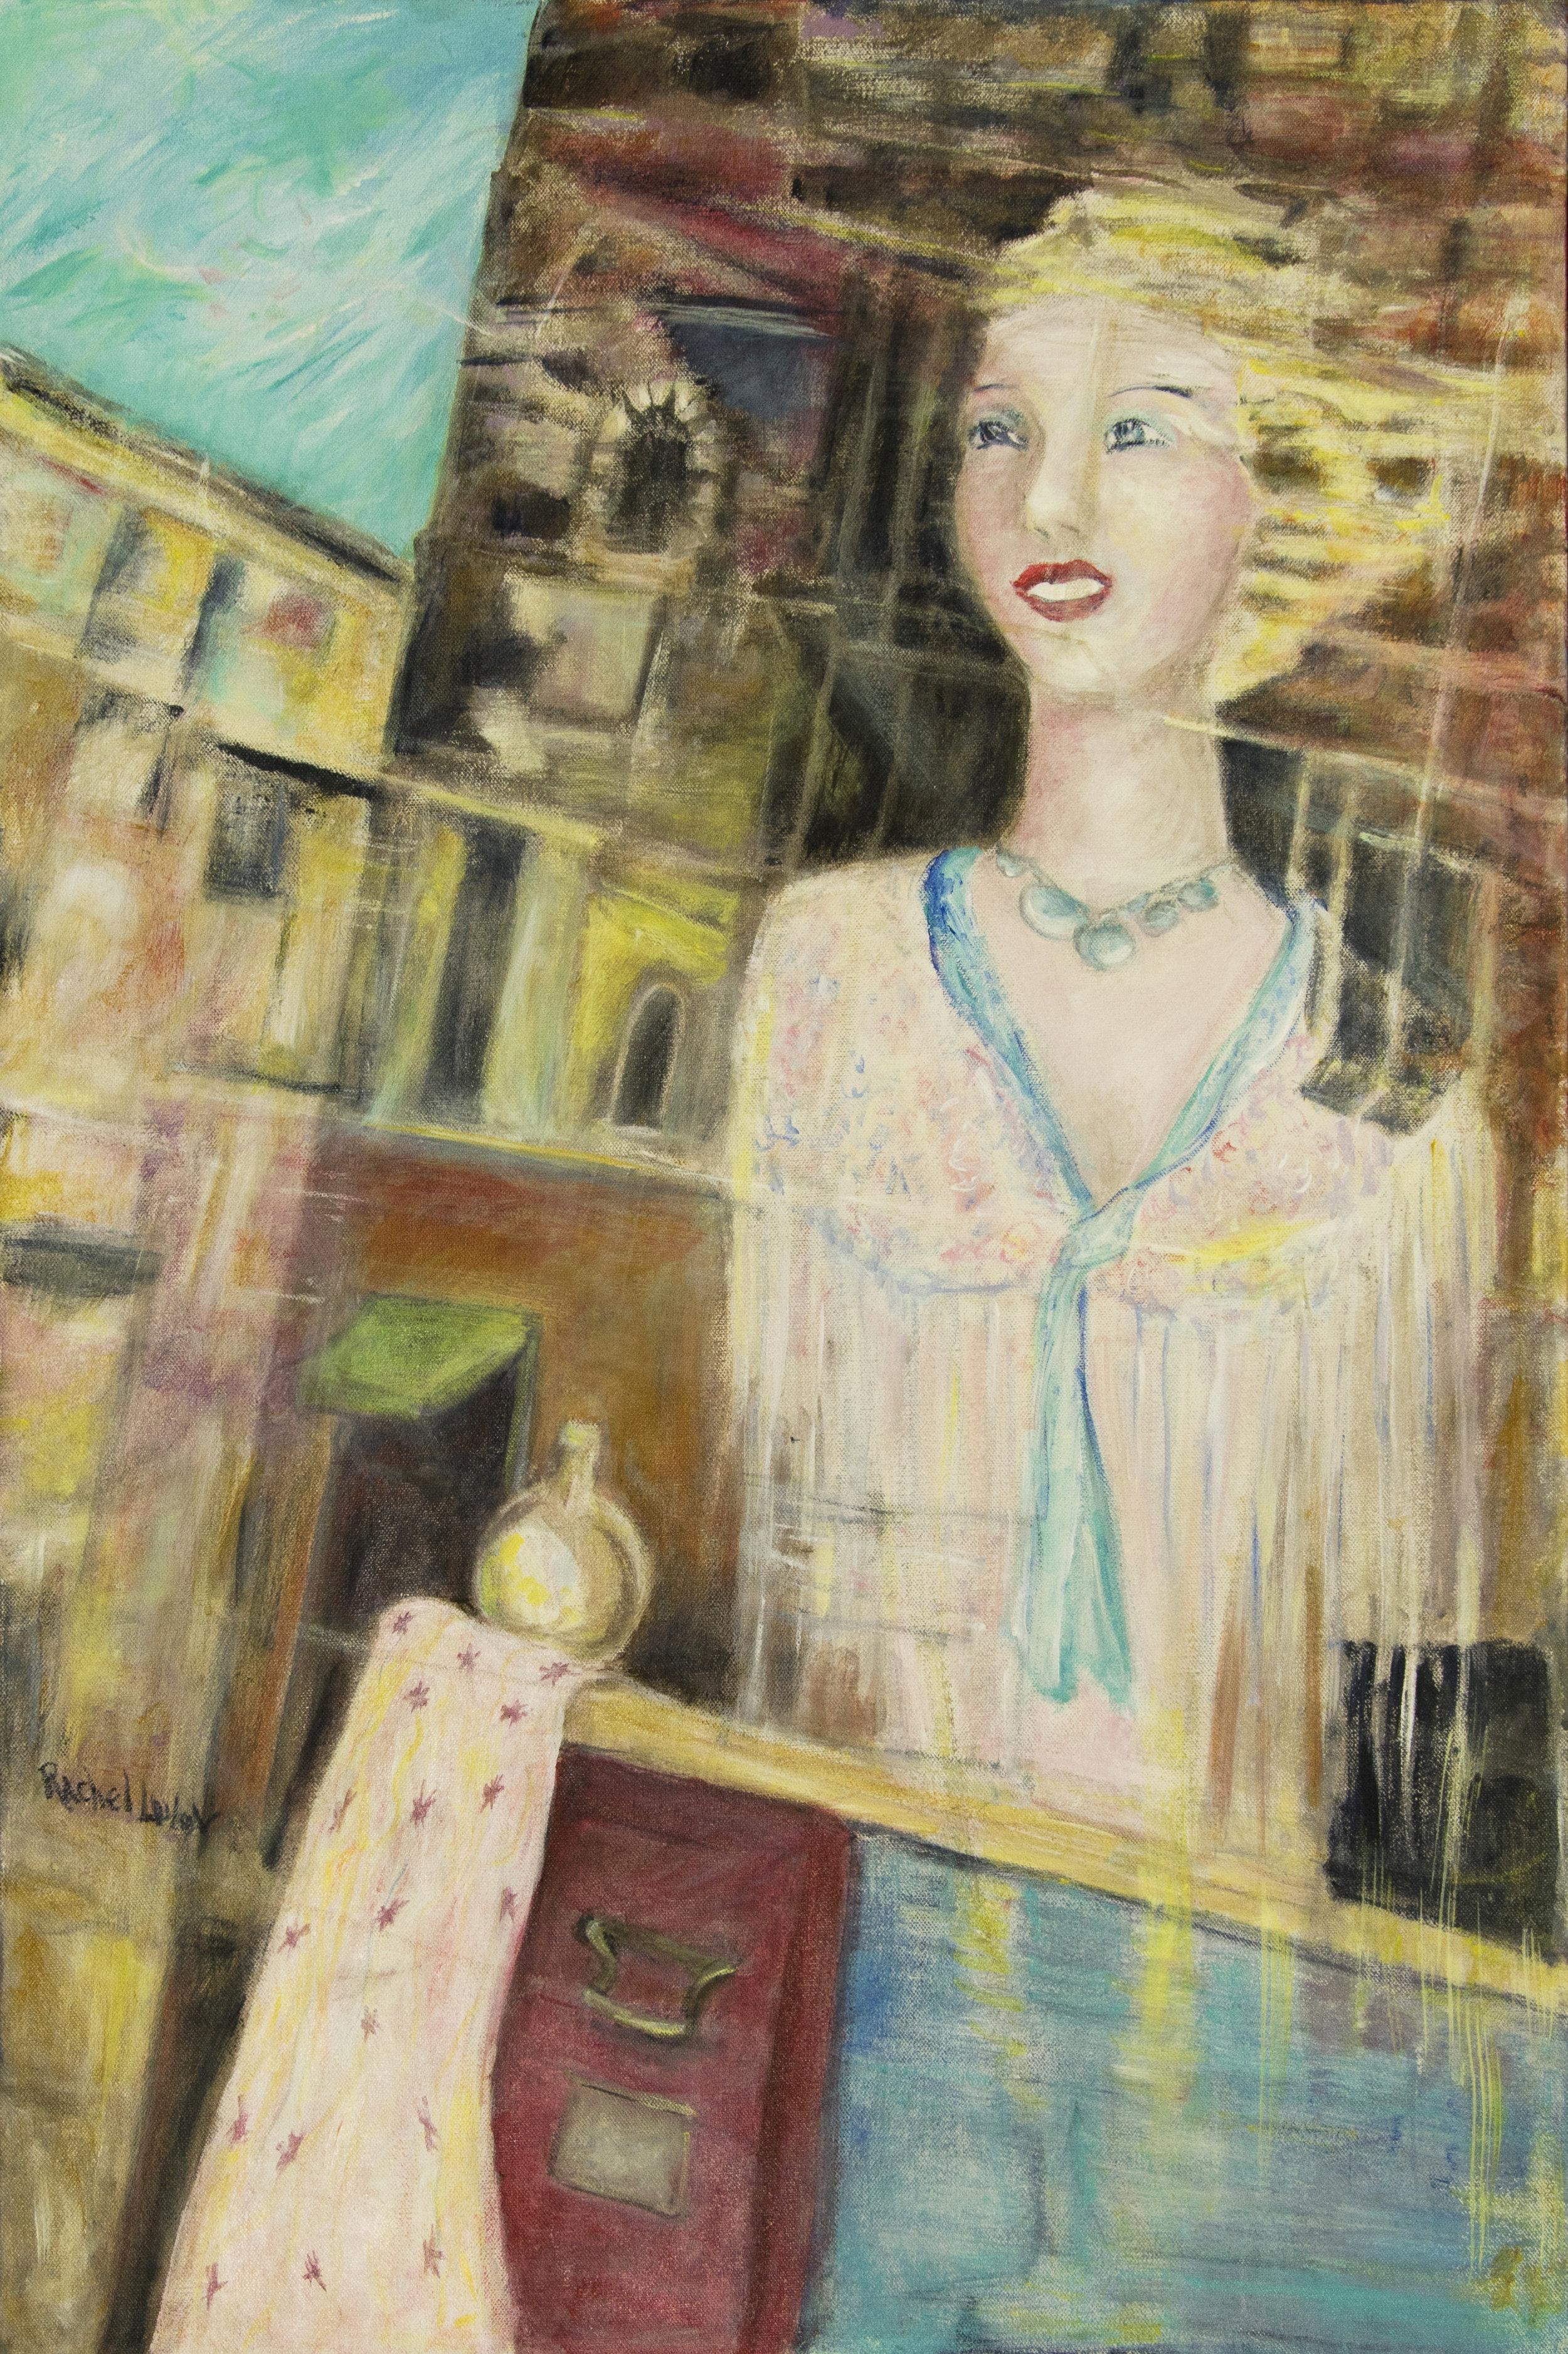 Reflection, acrylic on canvas, 24 x 38 Rachel Lulov Segall